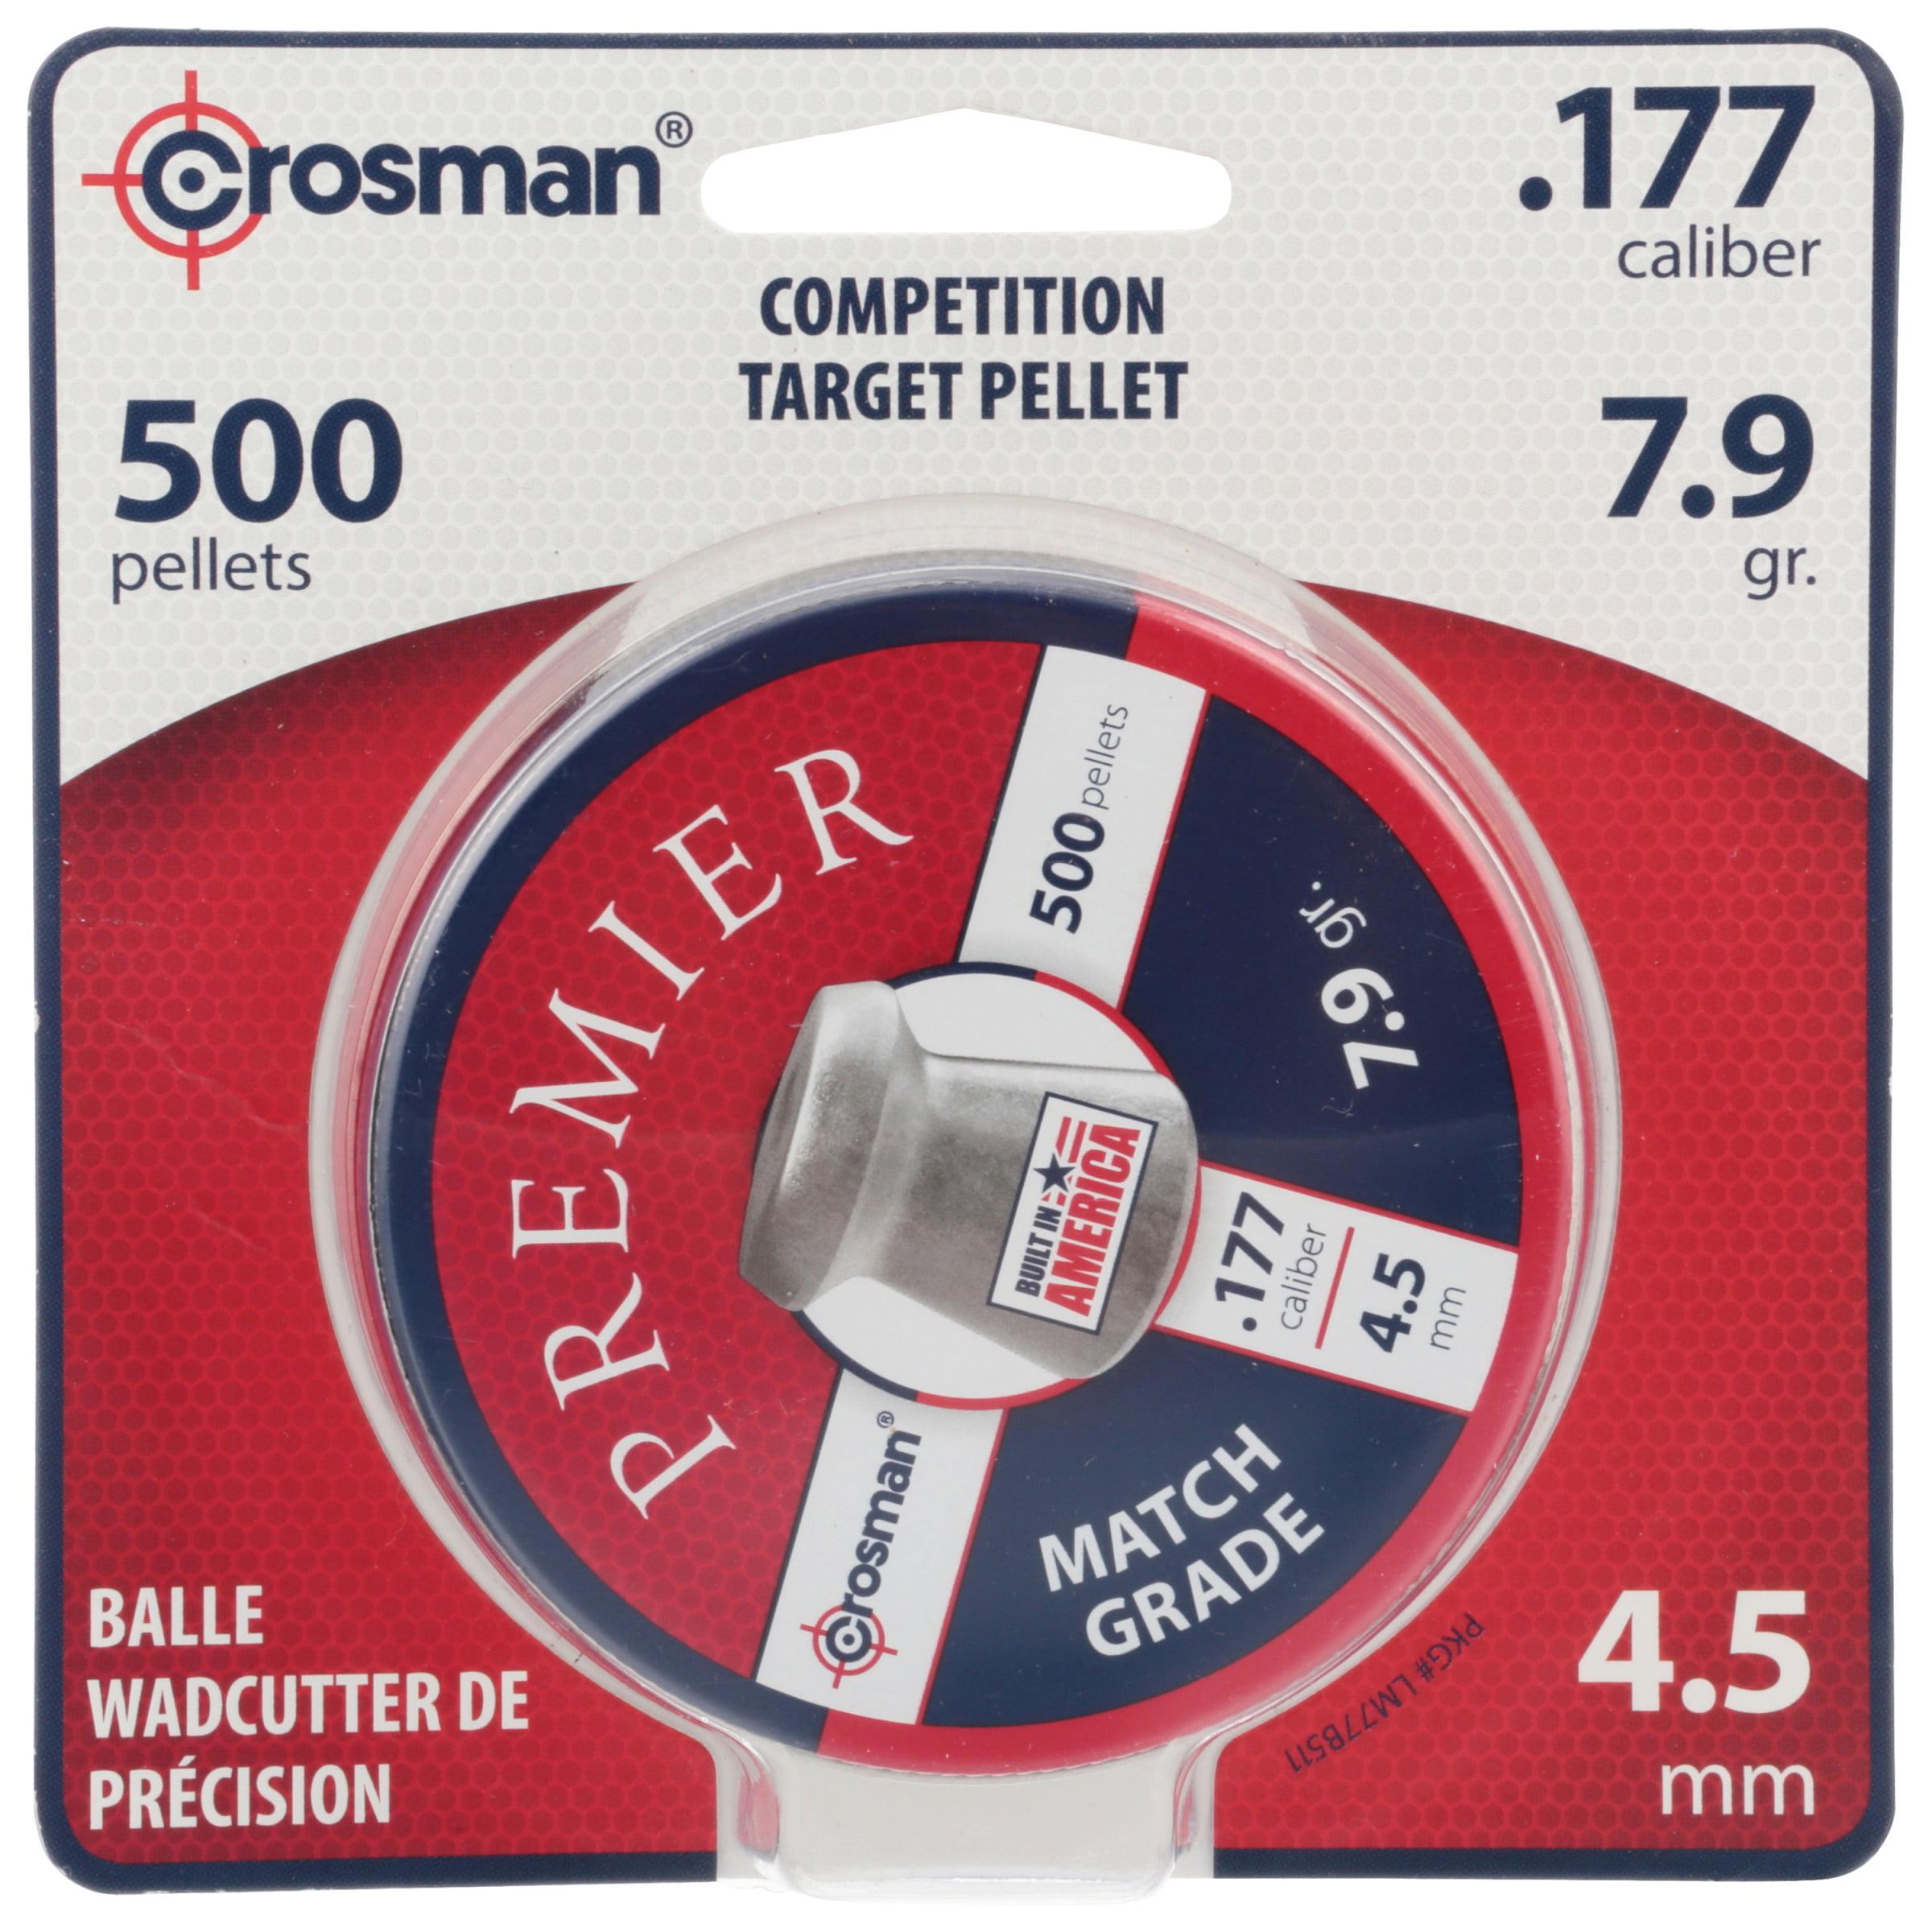 Crosman Premier 177 Caliber Match Grade Pellets 500ct LM77 by Crosman